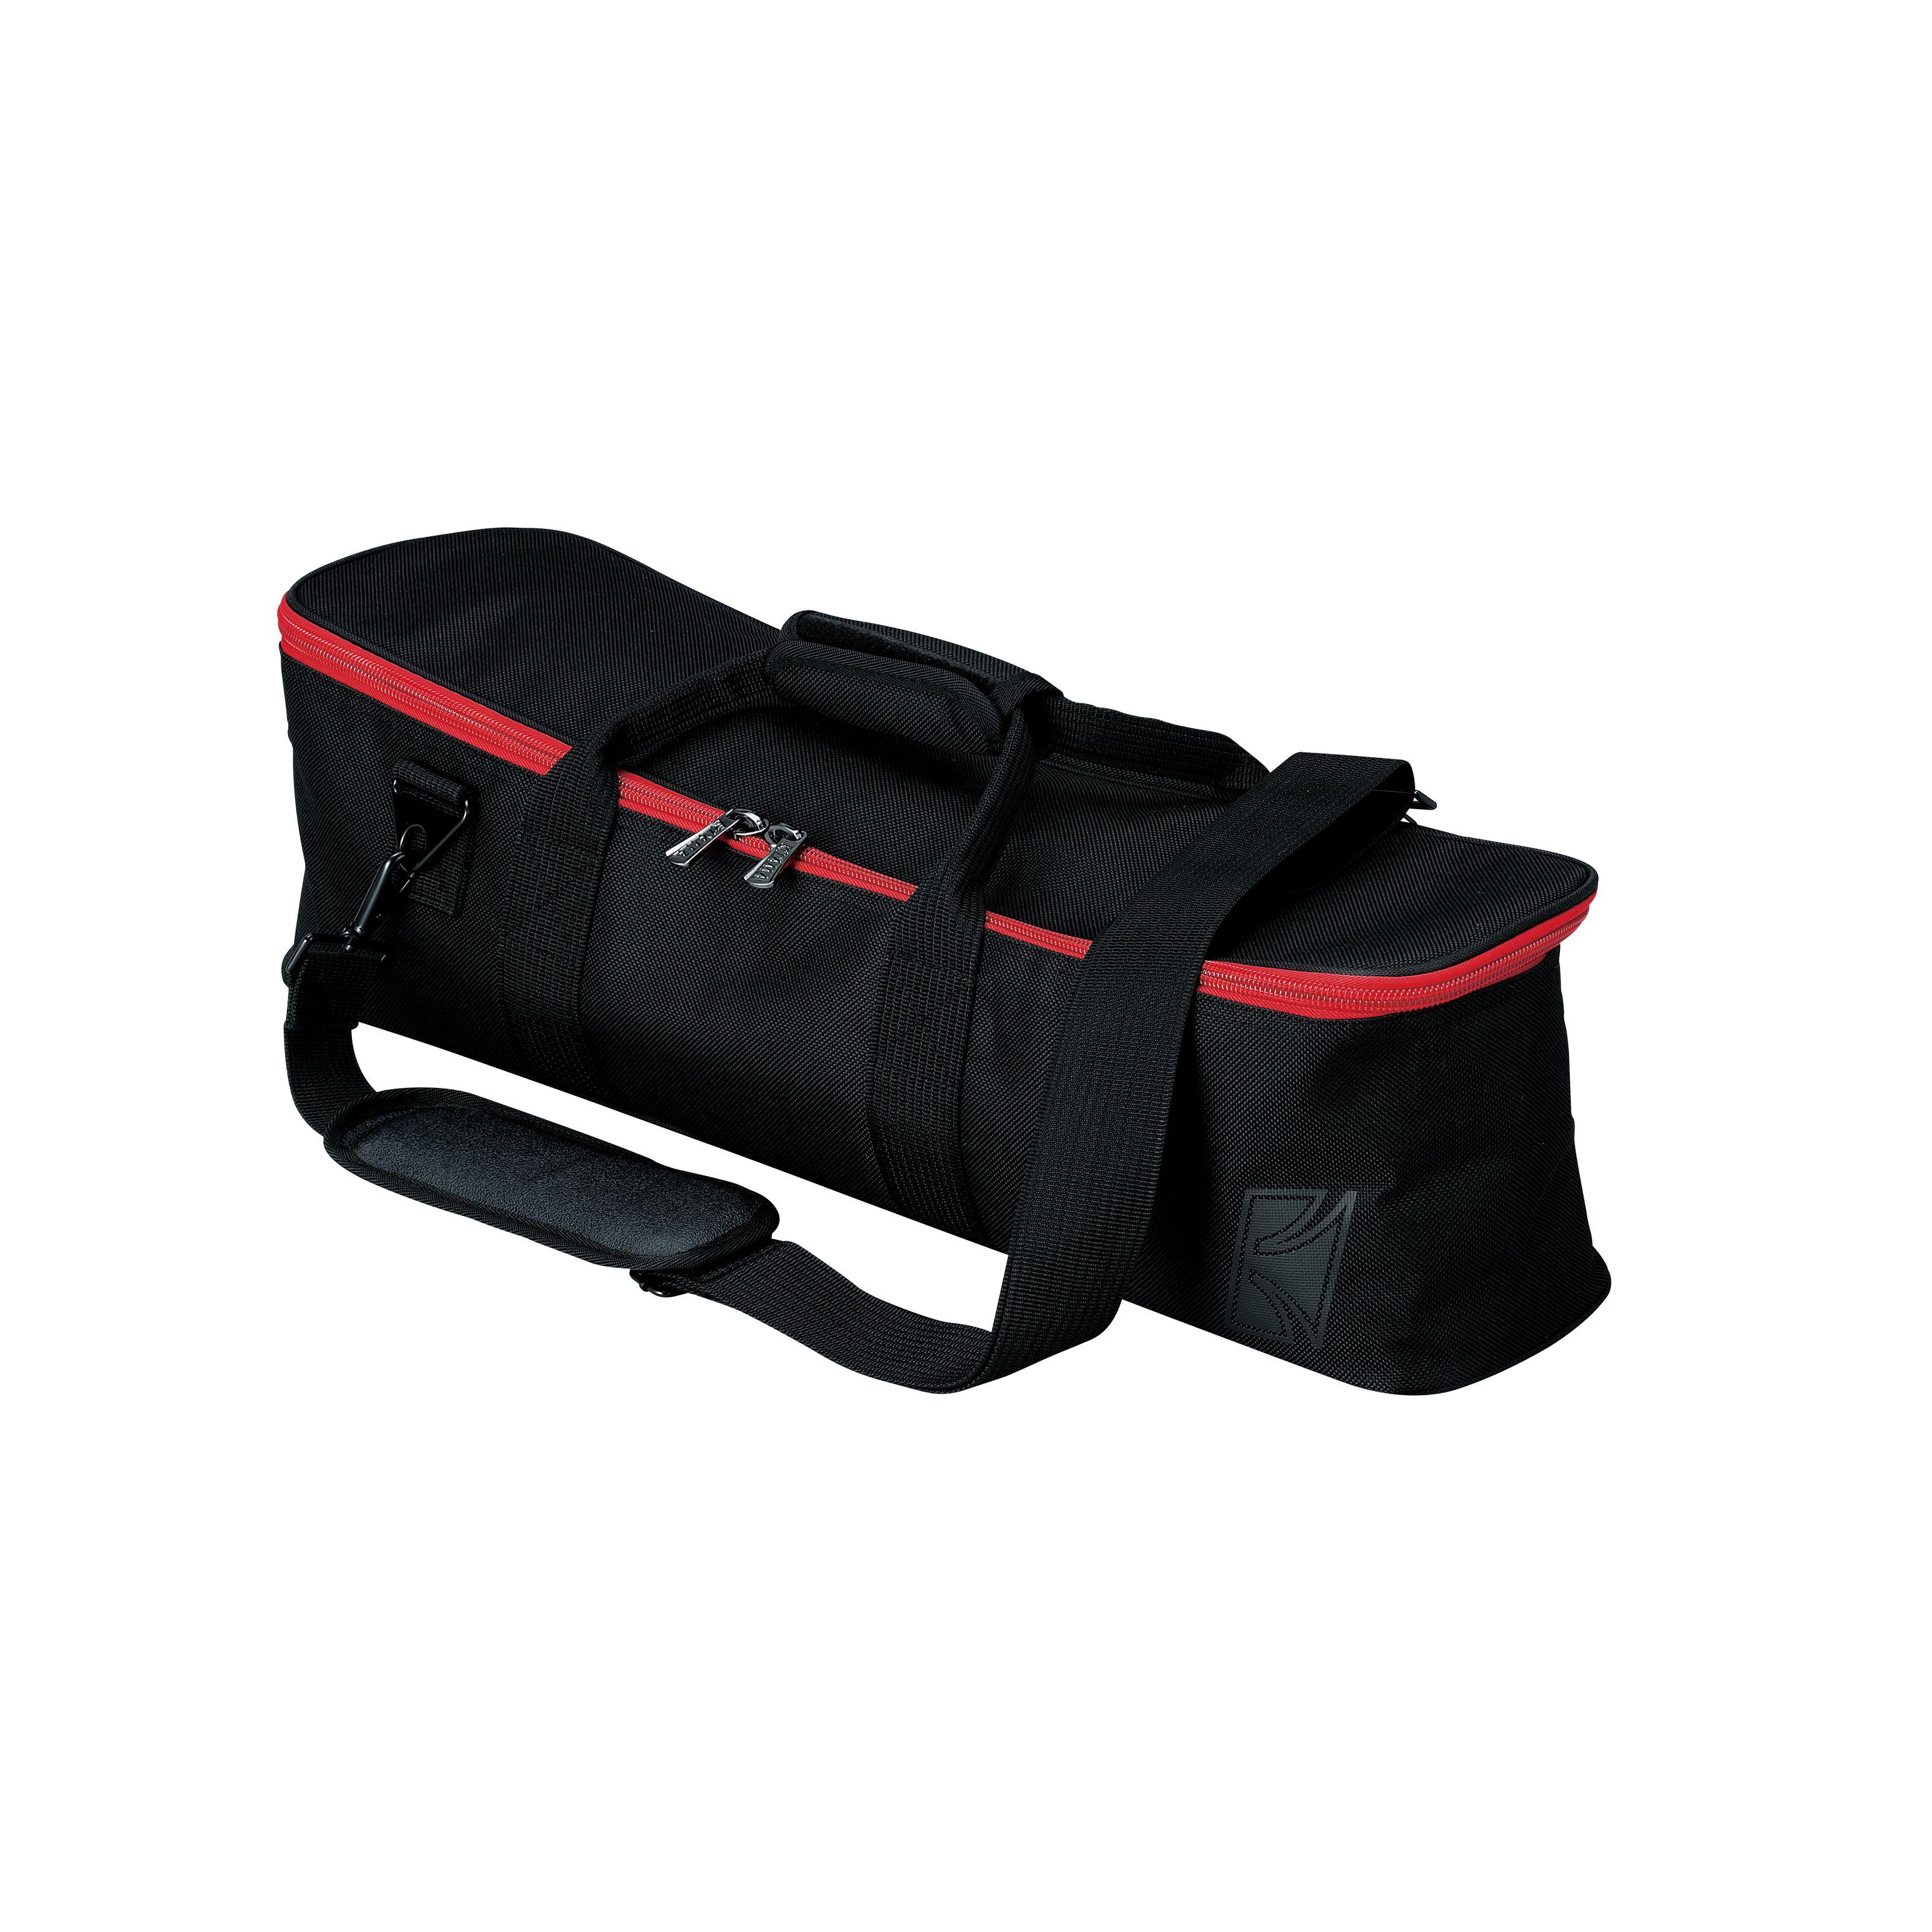 Tama - SBH01 Hardware Bag